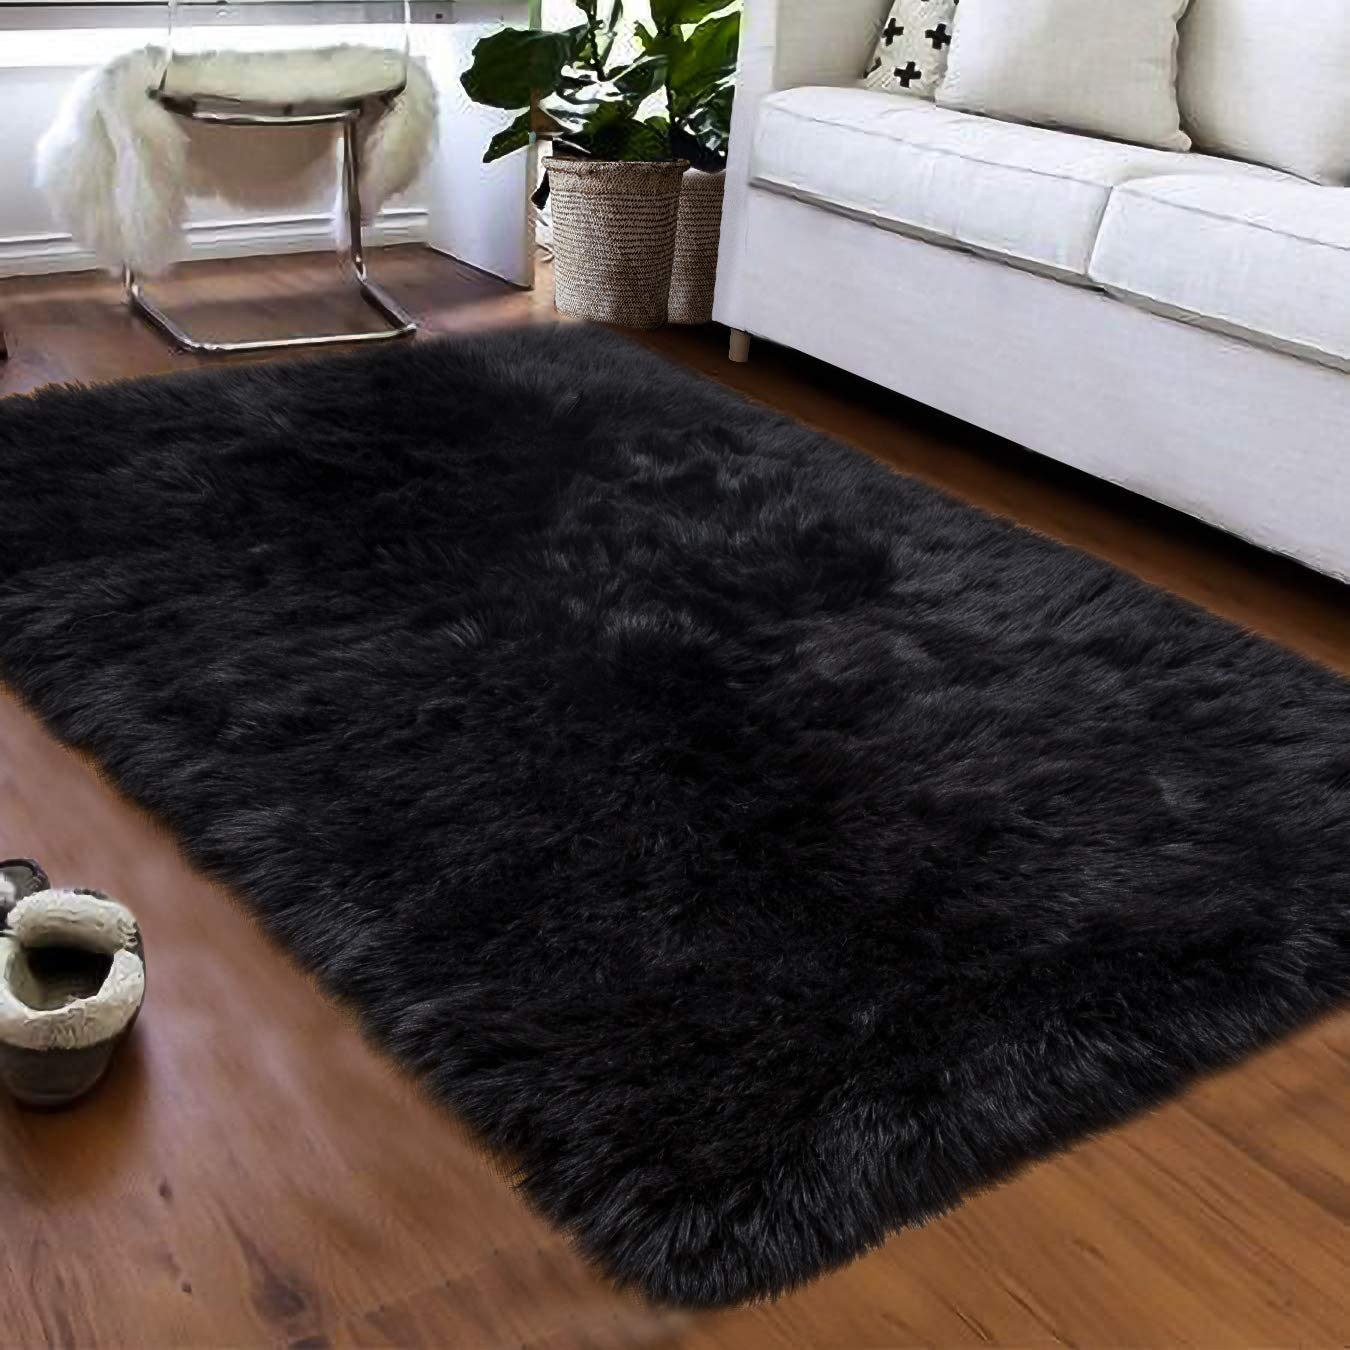 Softlife Fluffy Faux Fur Sheepskin Rugs Luxurious Wool Area Rug for Kids Room Bedroom Bedside Living Room Office Home Decor Carpet ( 3ft x 5ft, Black )